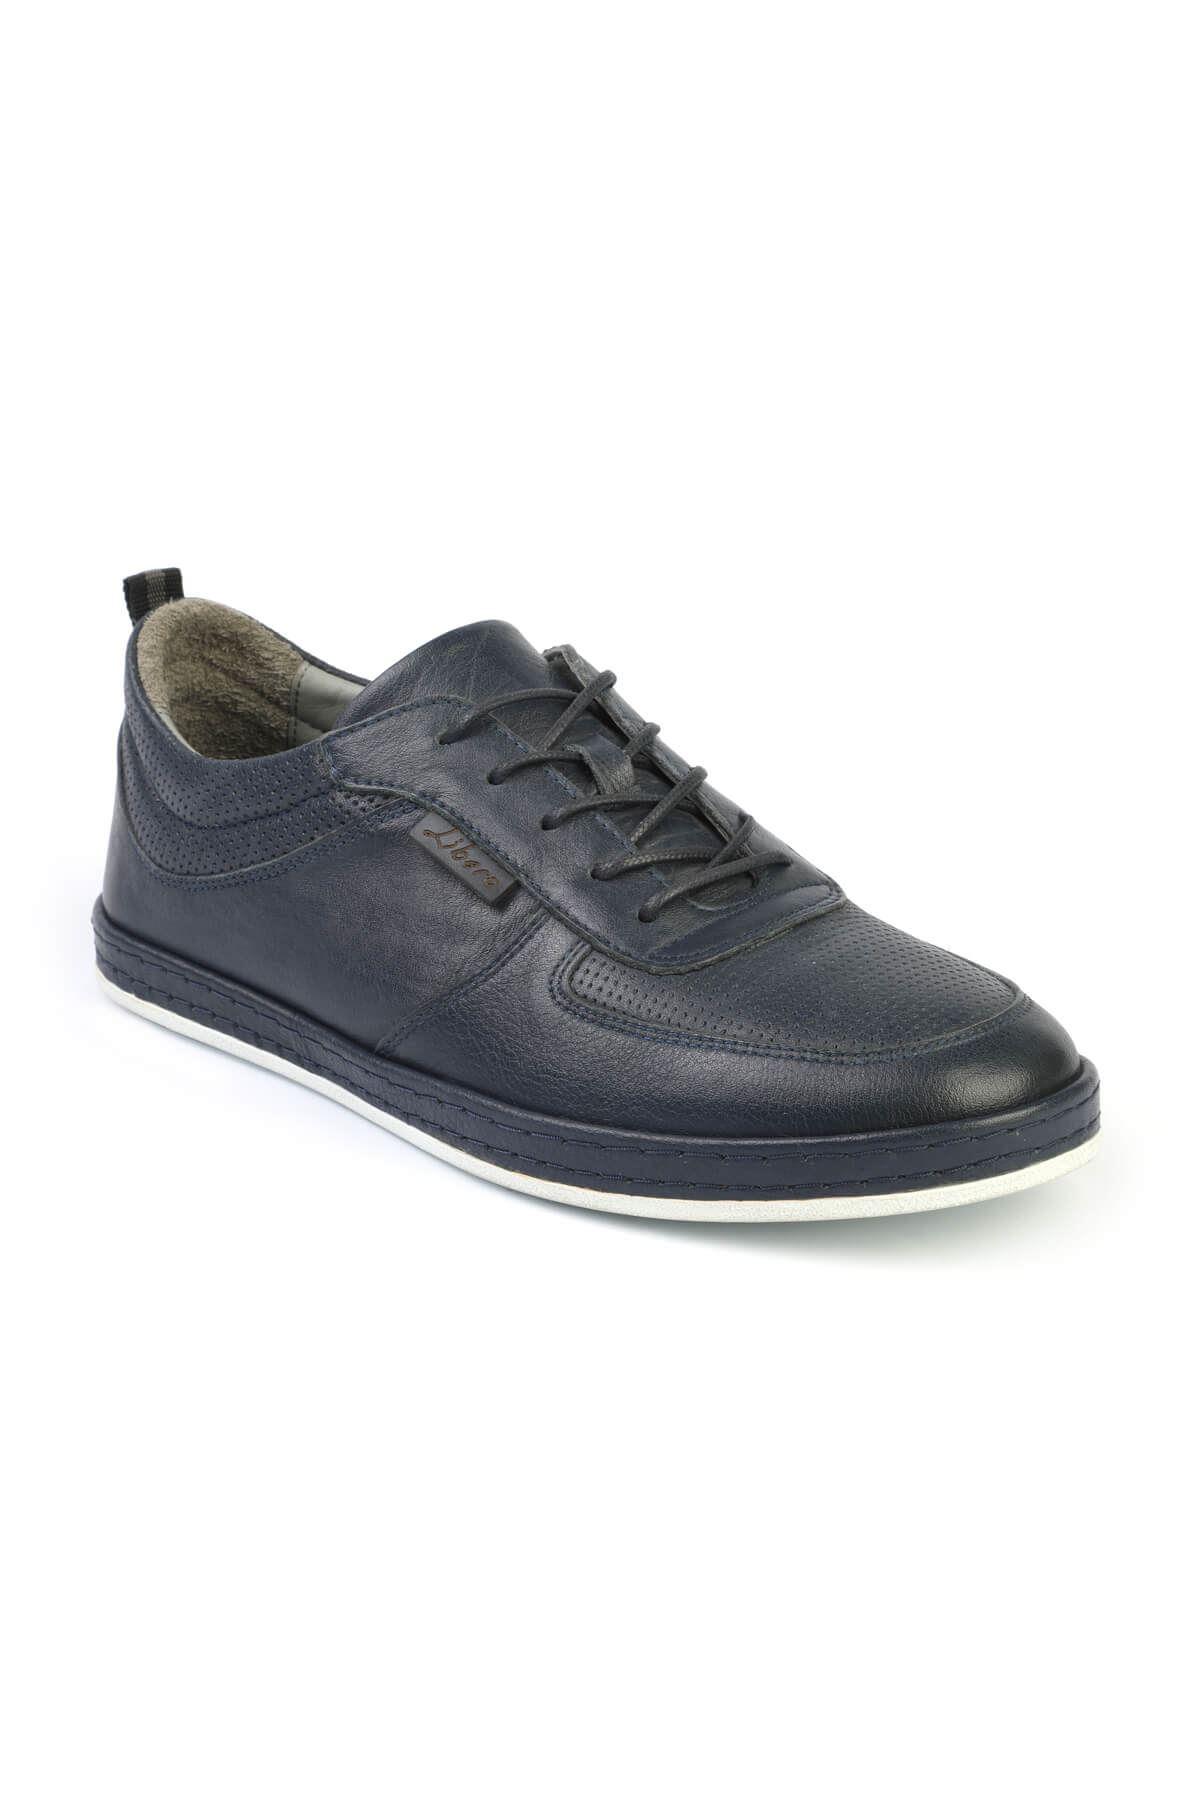 Libero 3063 Navy Blue Sport Shoes